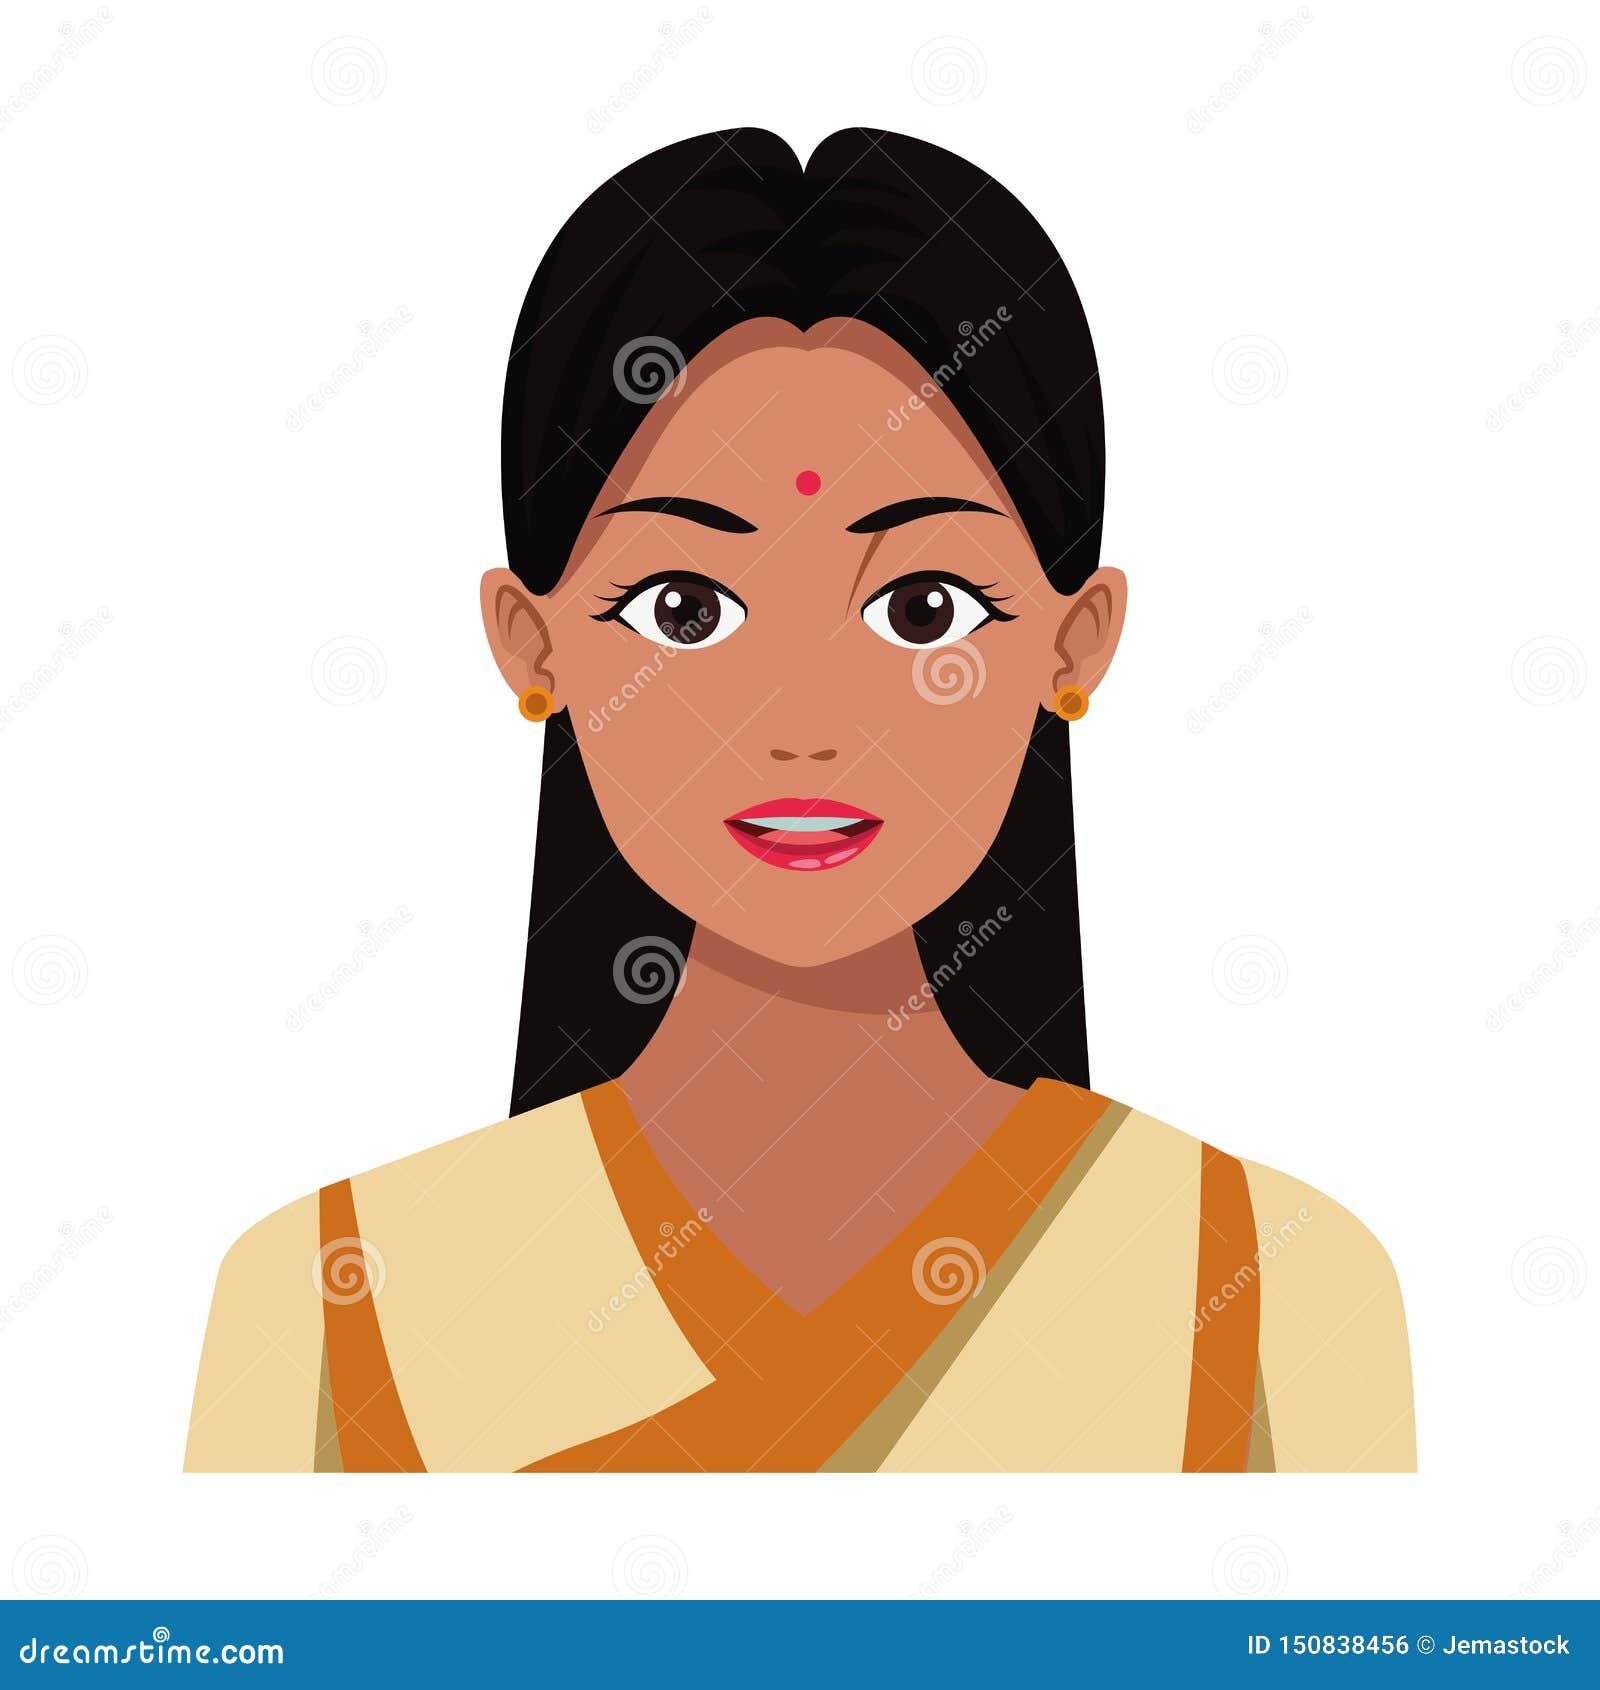 Indian Cartoon Girl Stock Illustrations 5 945 Indian Cartoon Girl Stock Illustrations Vectors Clipart Dreamstime